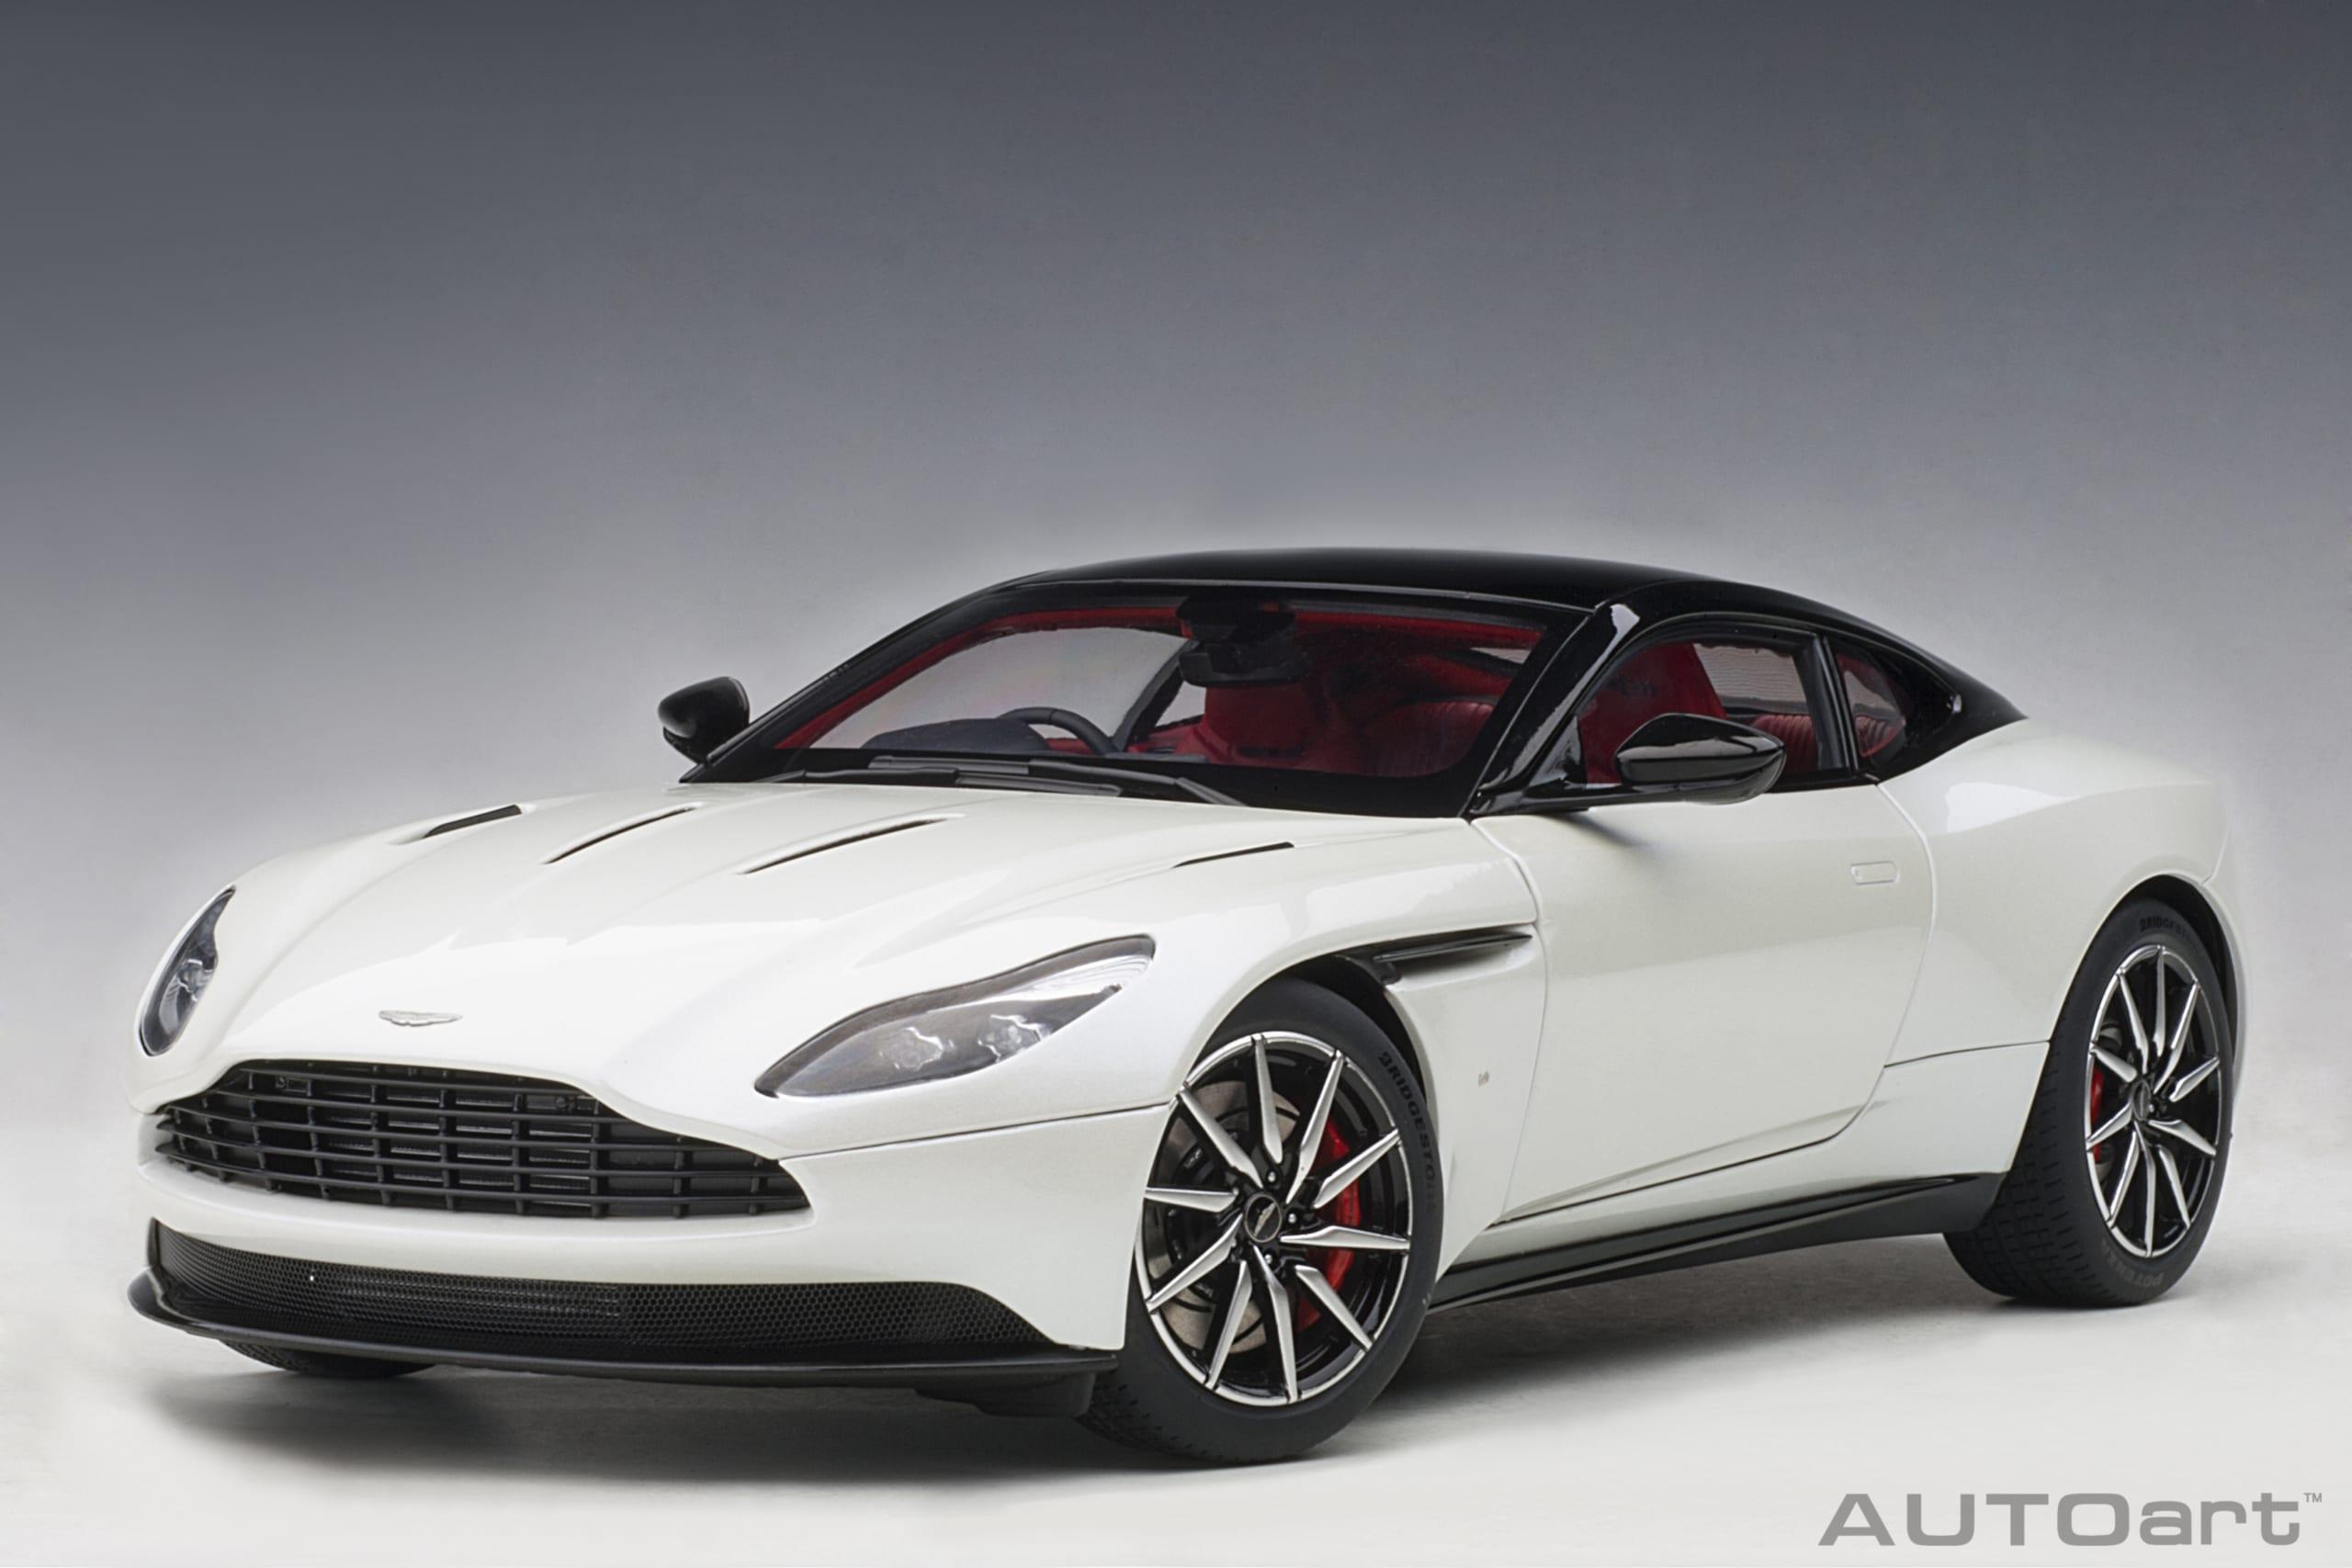 Autoart Aston Martin Db11 Morning Frost White 1 18 70266 Automodelismo Y Aeromodelismo Juguetes